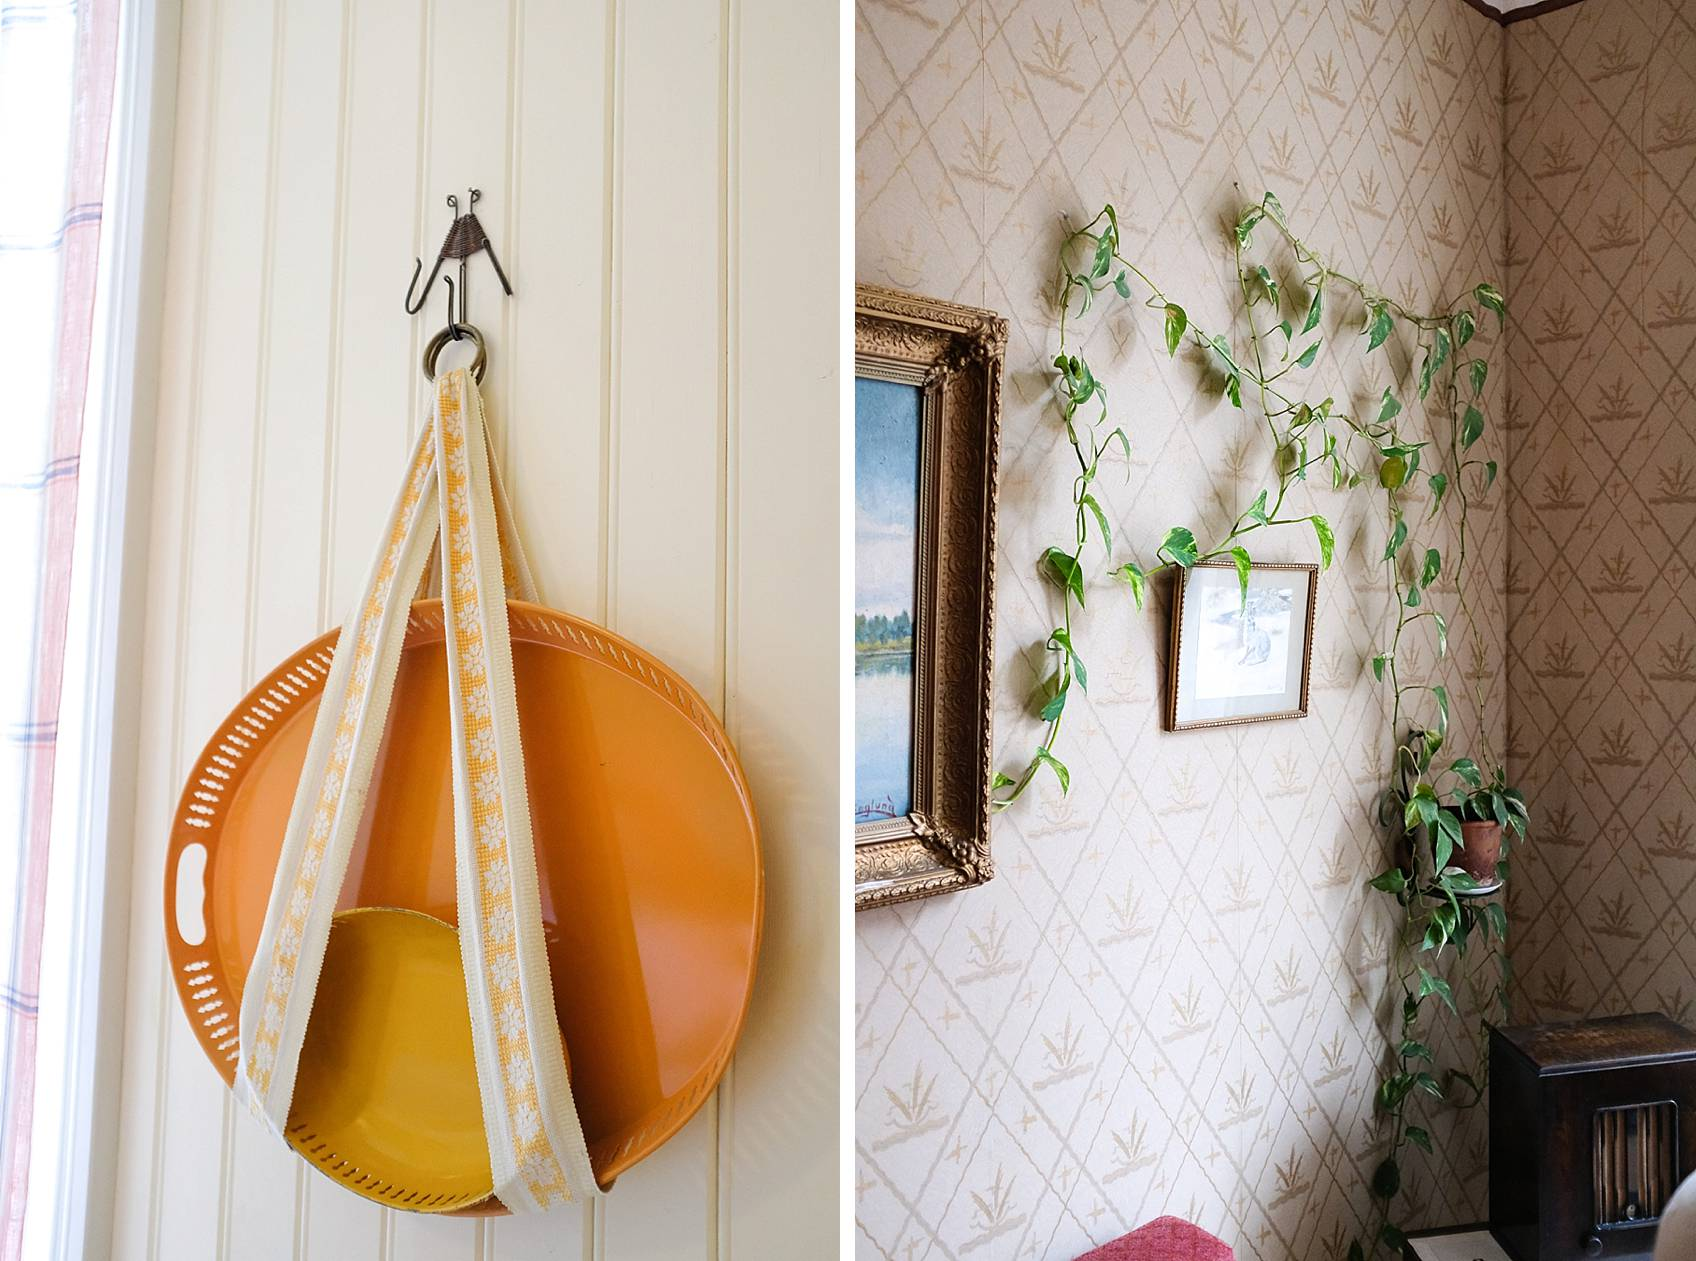 skansen stockholm cottage living decor for inspiration, inside home hanging serveware platter and vines on wall with hooks